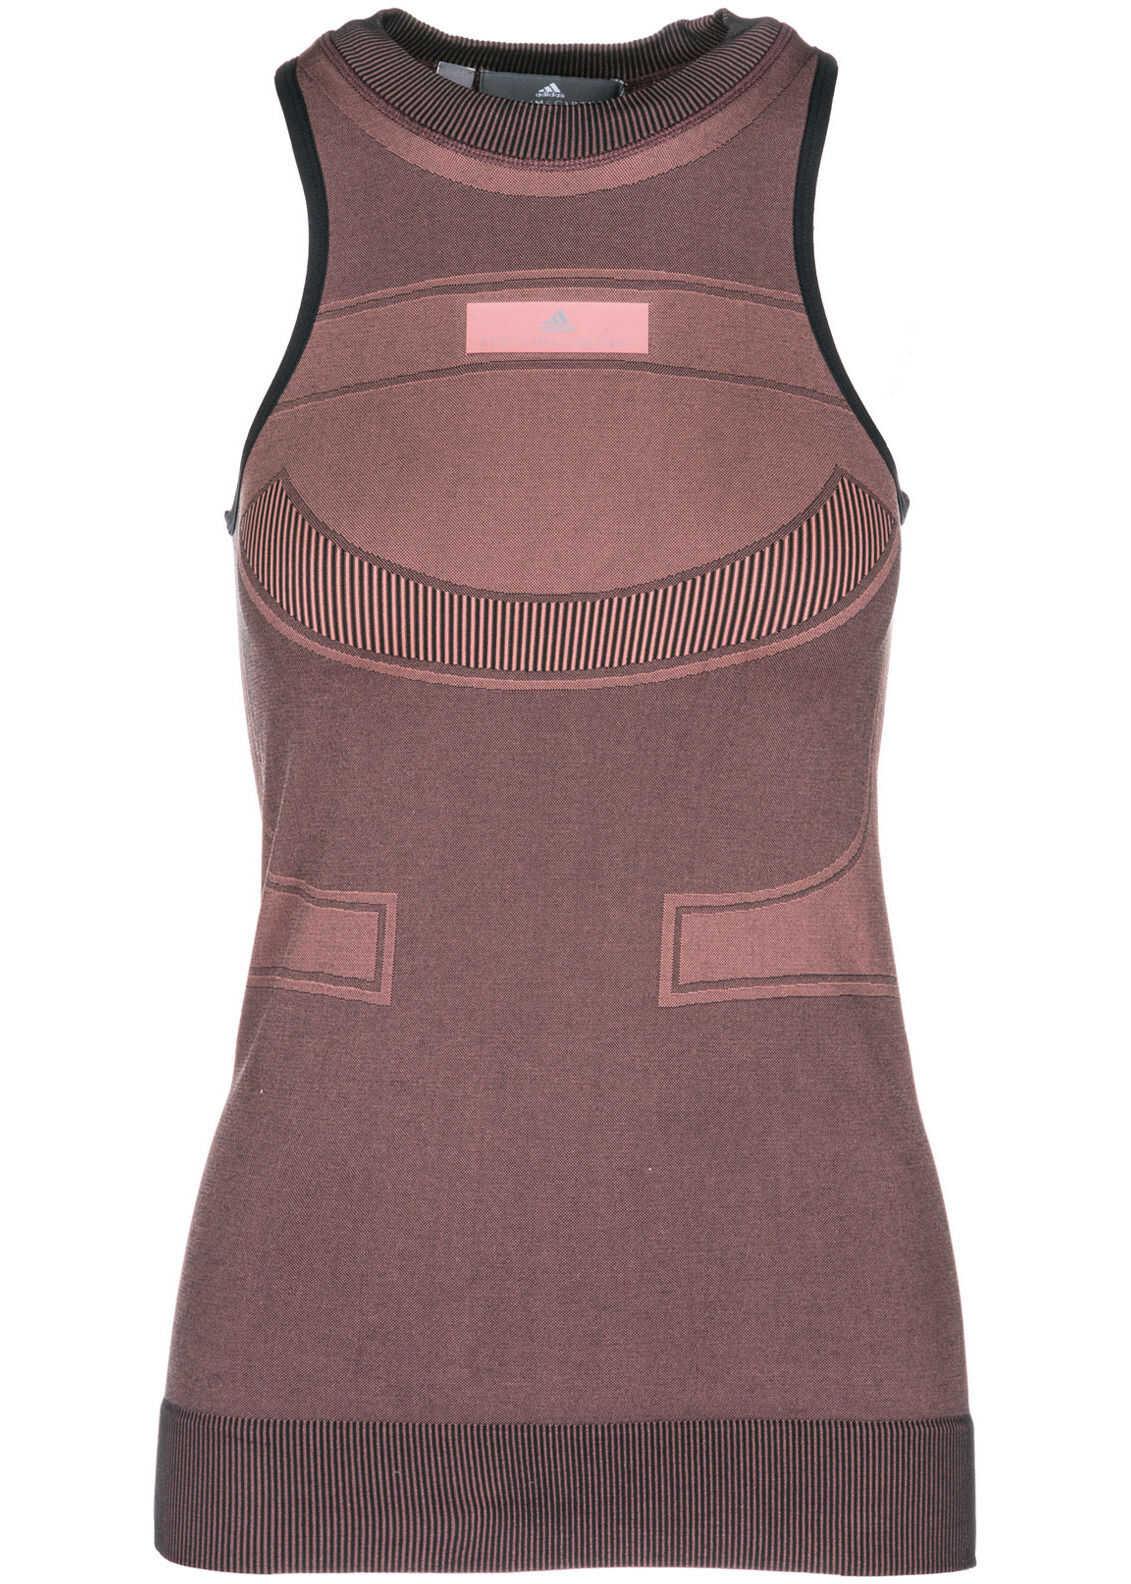 adidas by Stella McCartney Vest Running Pink